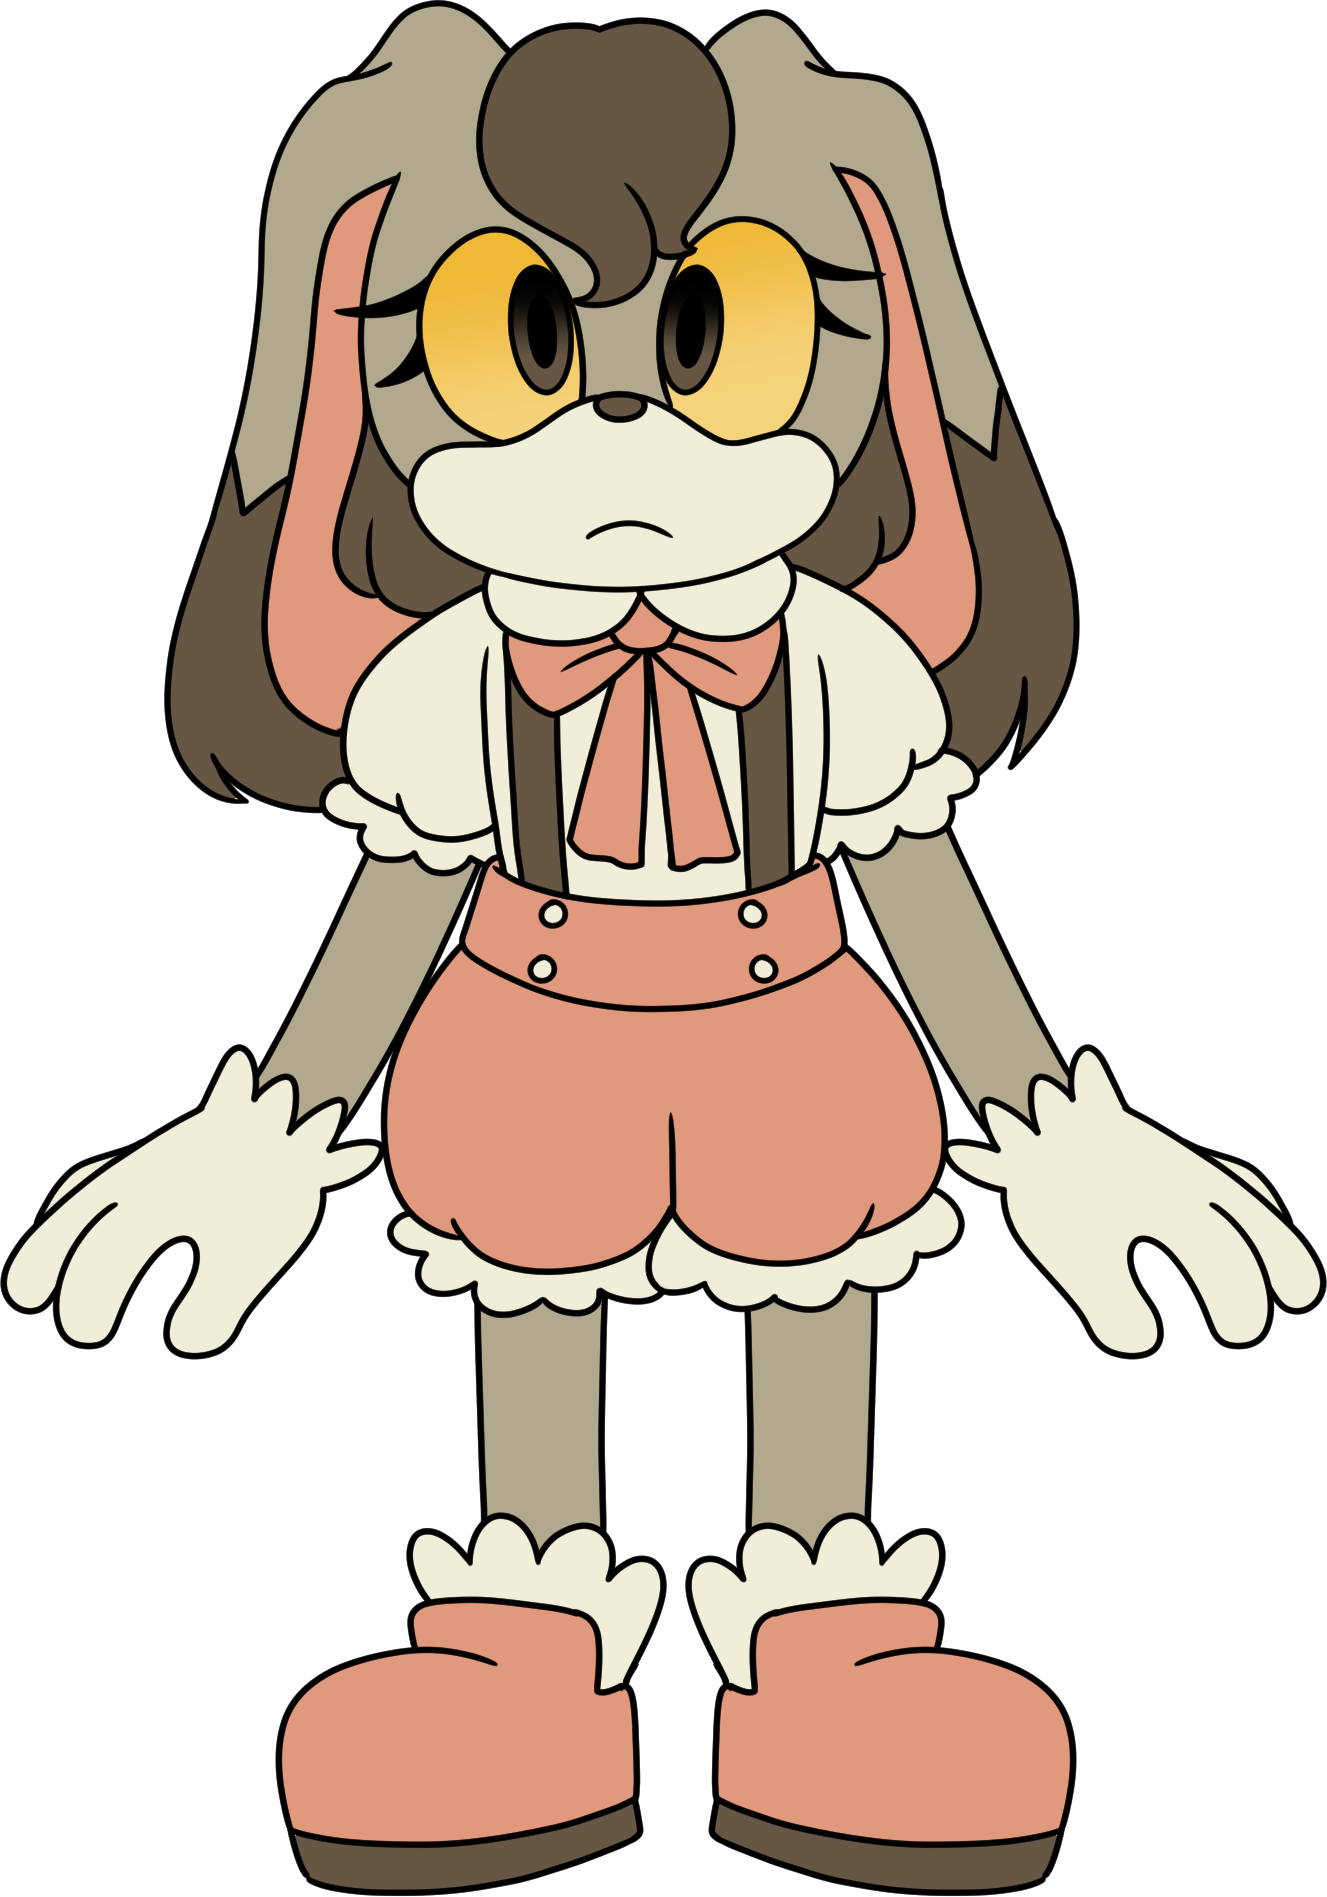 Pumpkaboo + Cream the Rabbit fusion